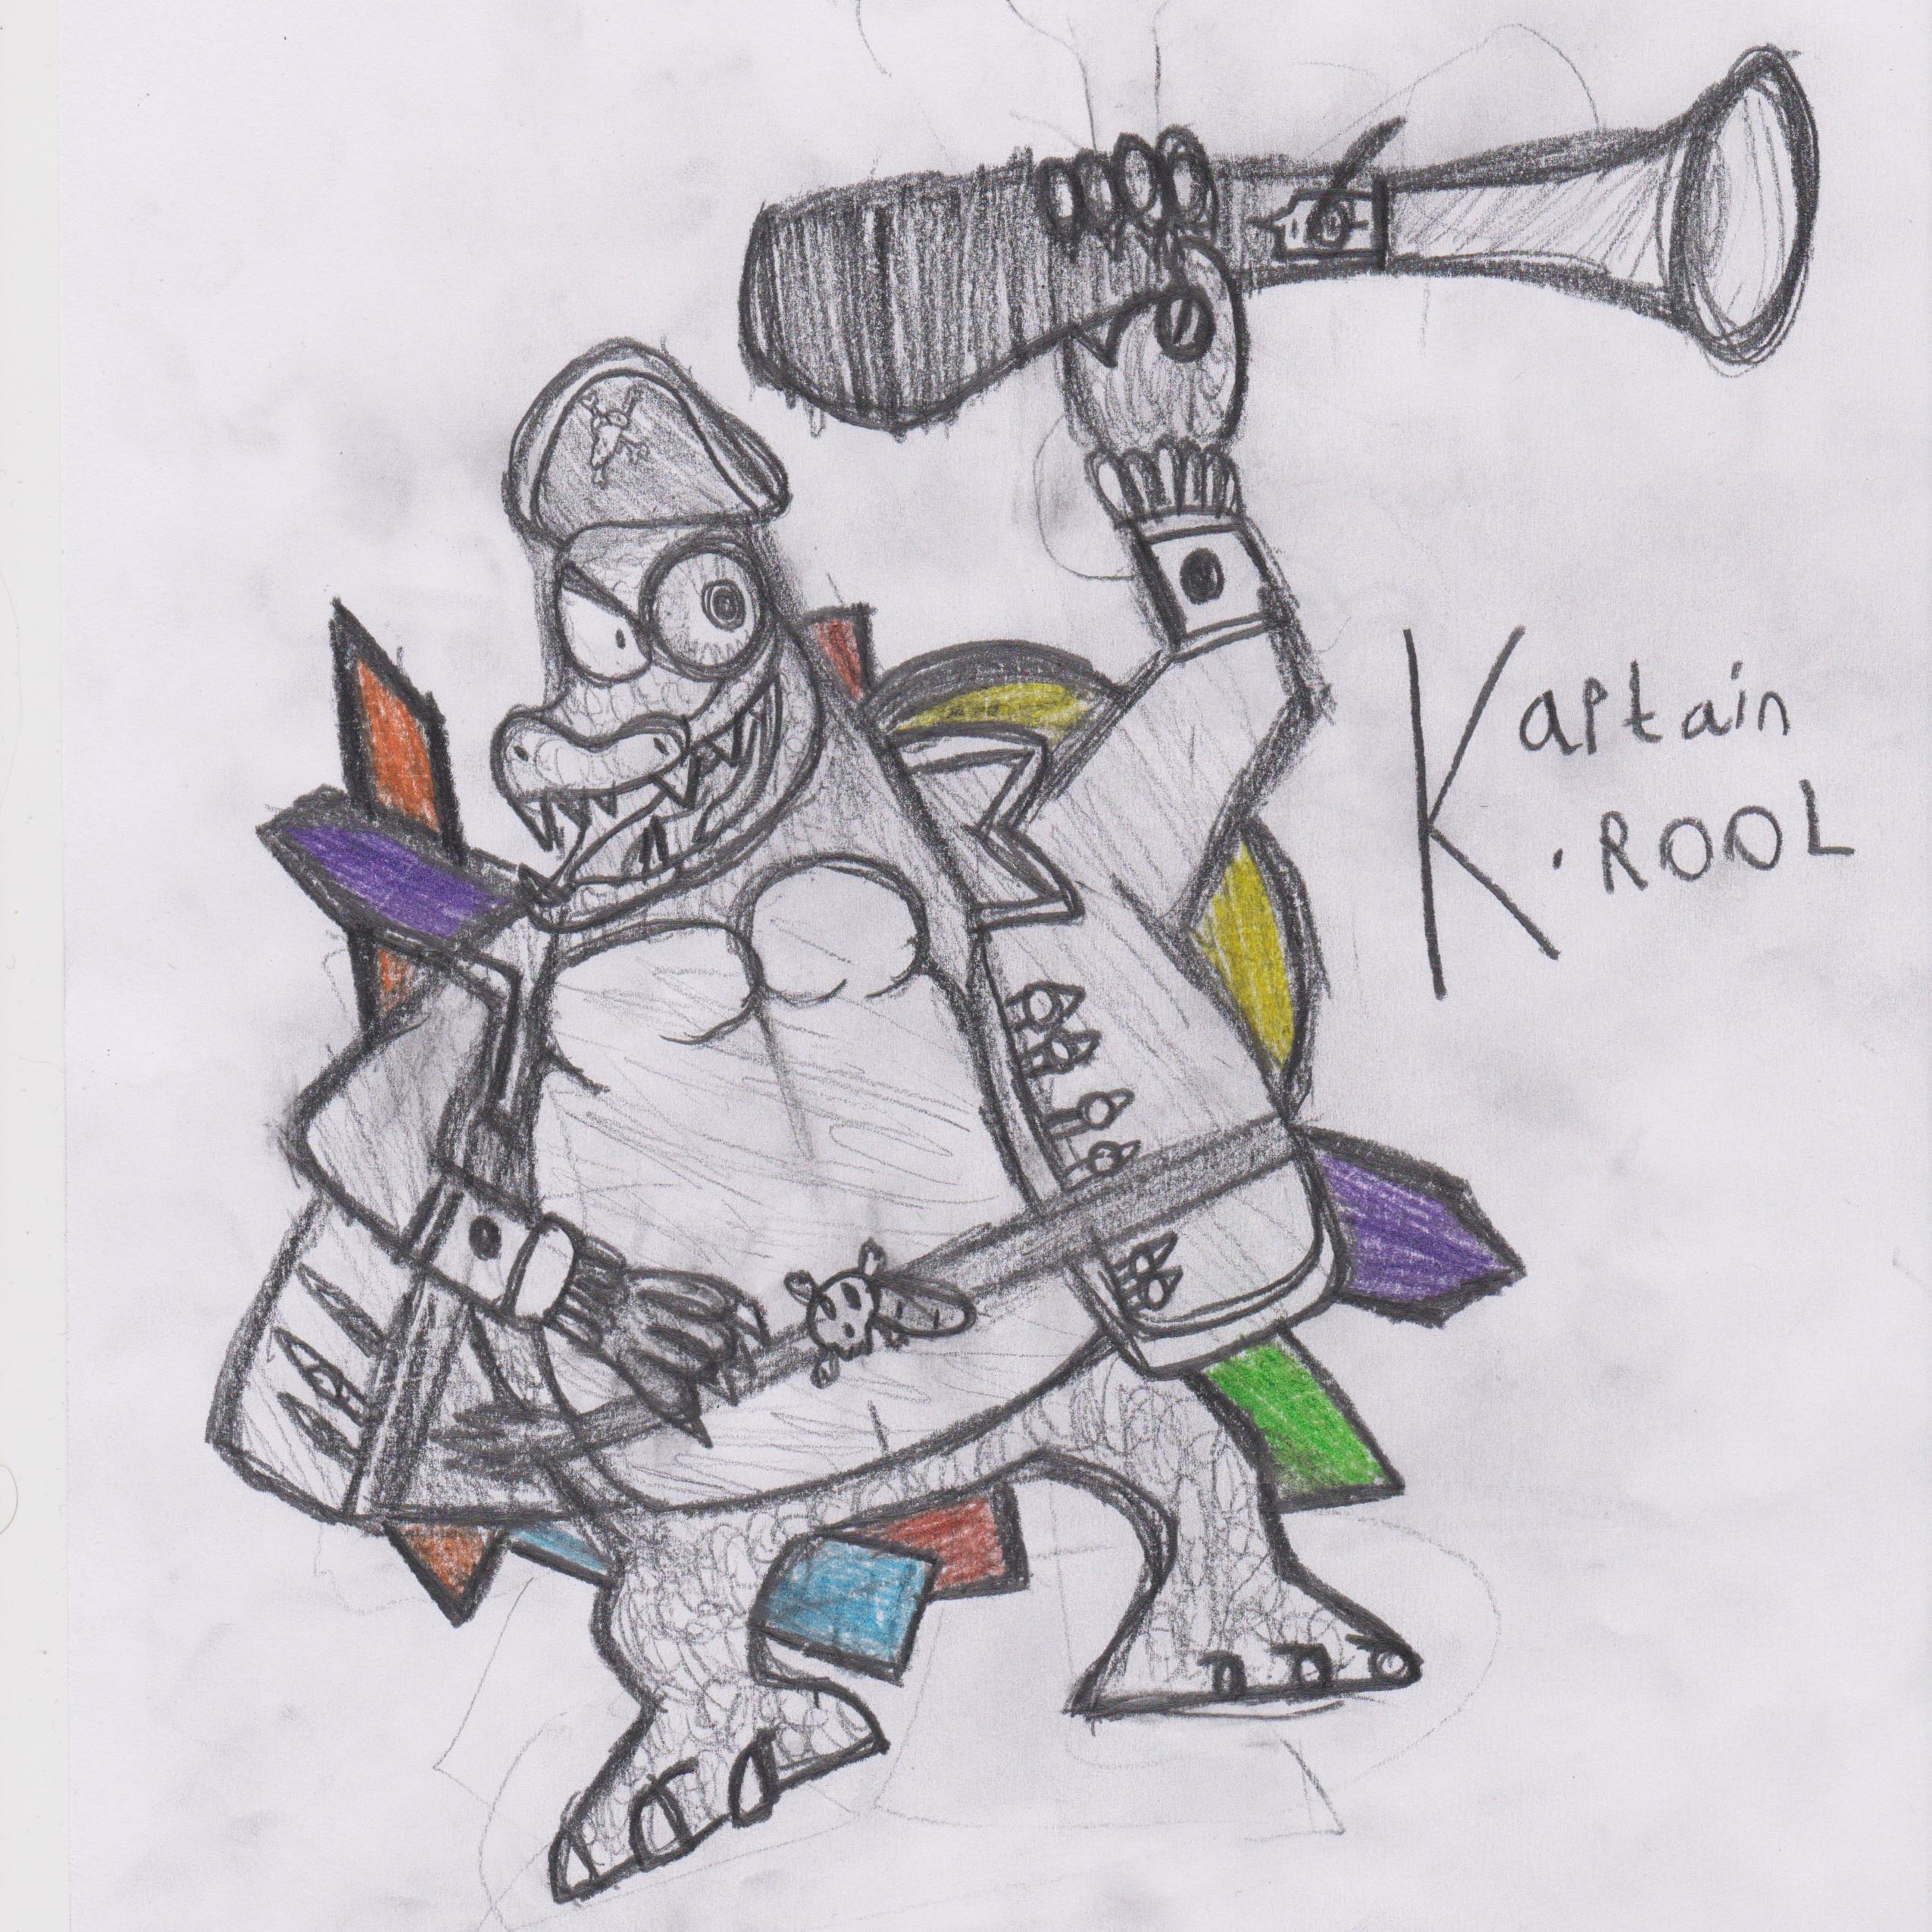 Kaptain K.Rool (DK Vine DKC2 Relay Art Contest Submission)